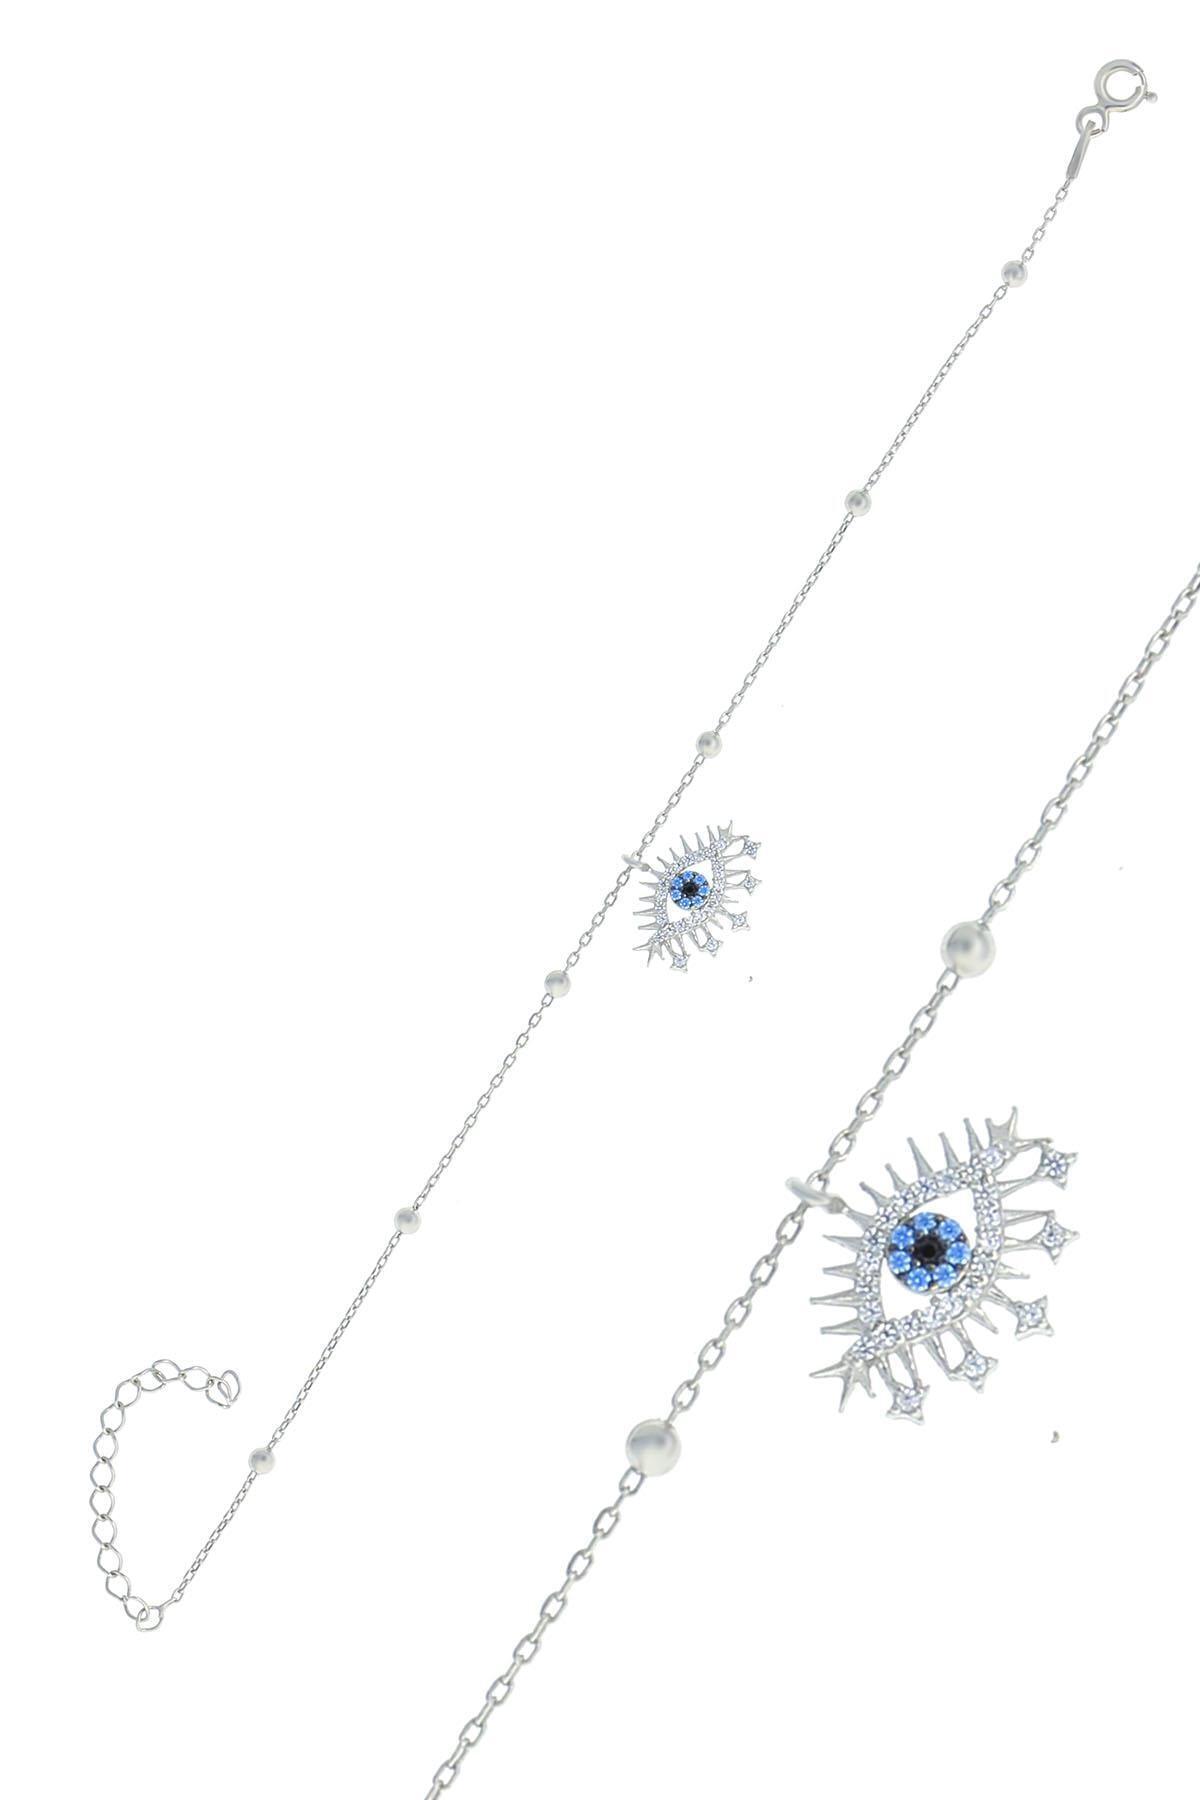 Söğütlü Silver Gümüş Rodyumlu Top Top Zincirli Lareyn Bileklik